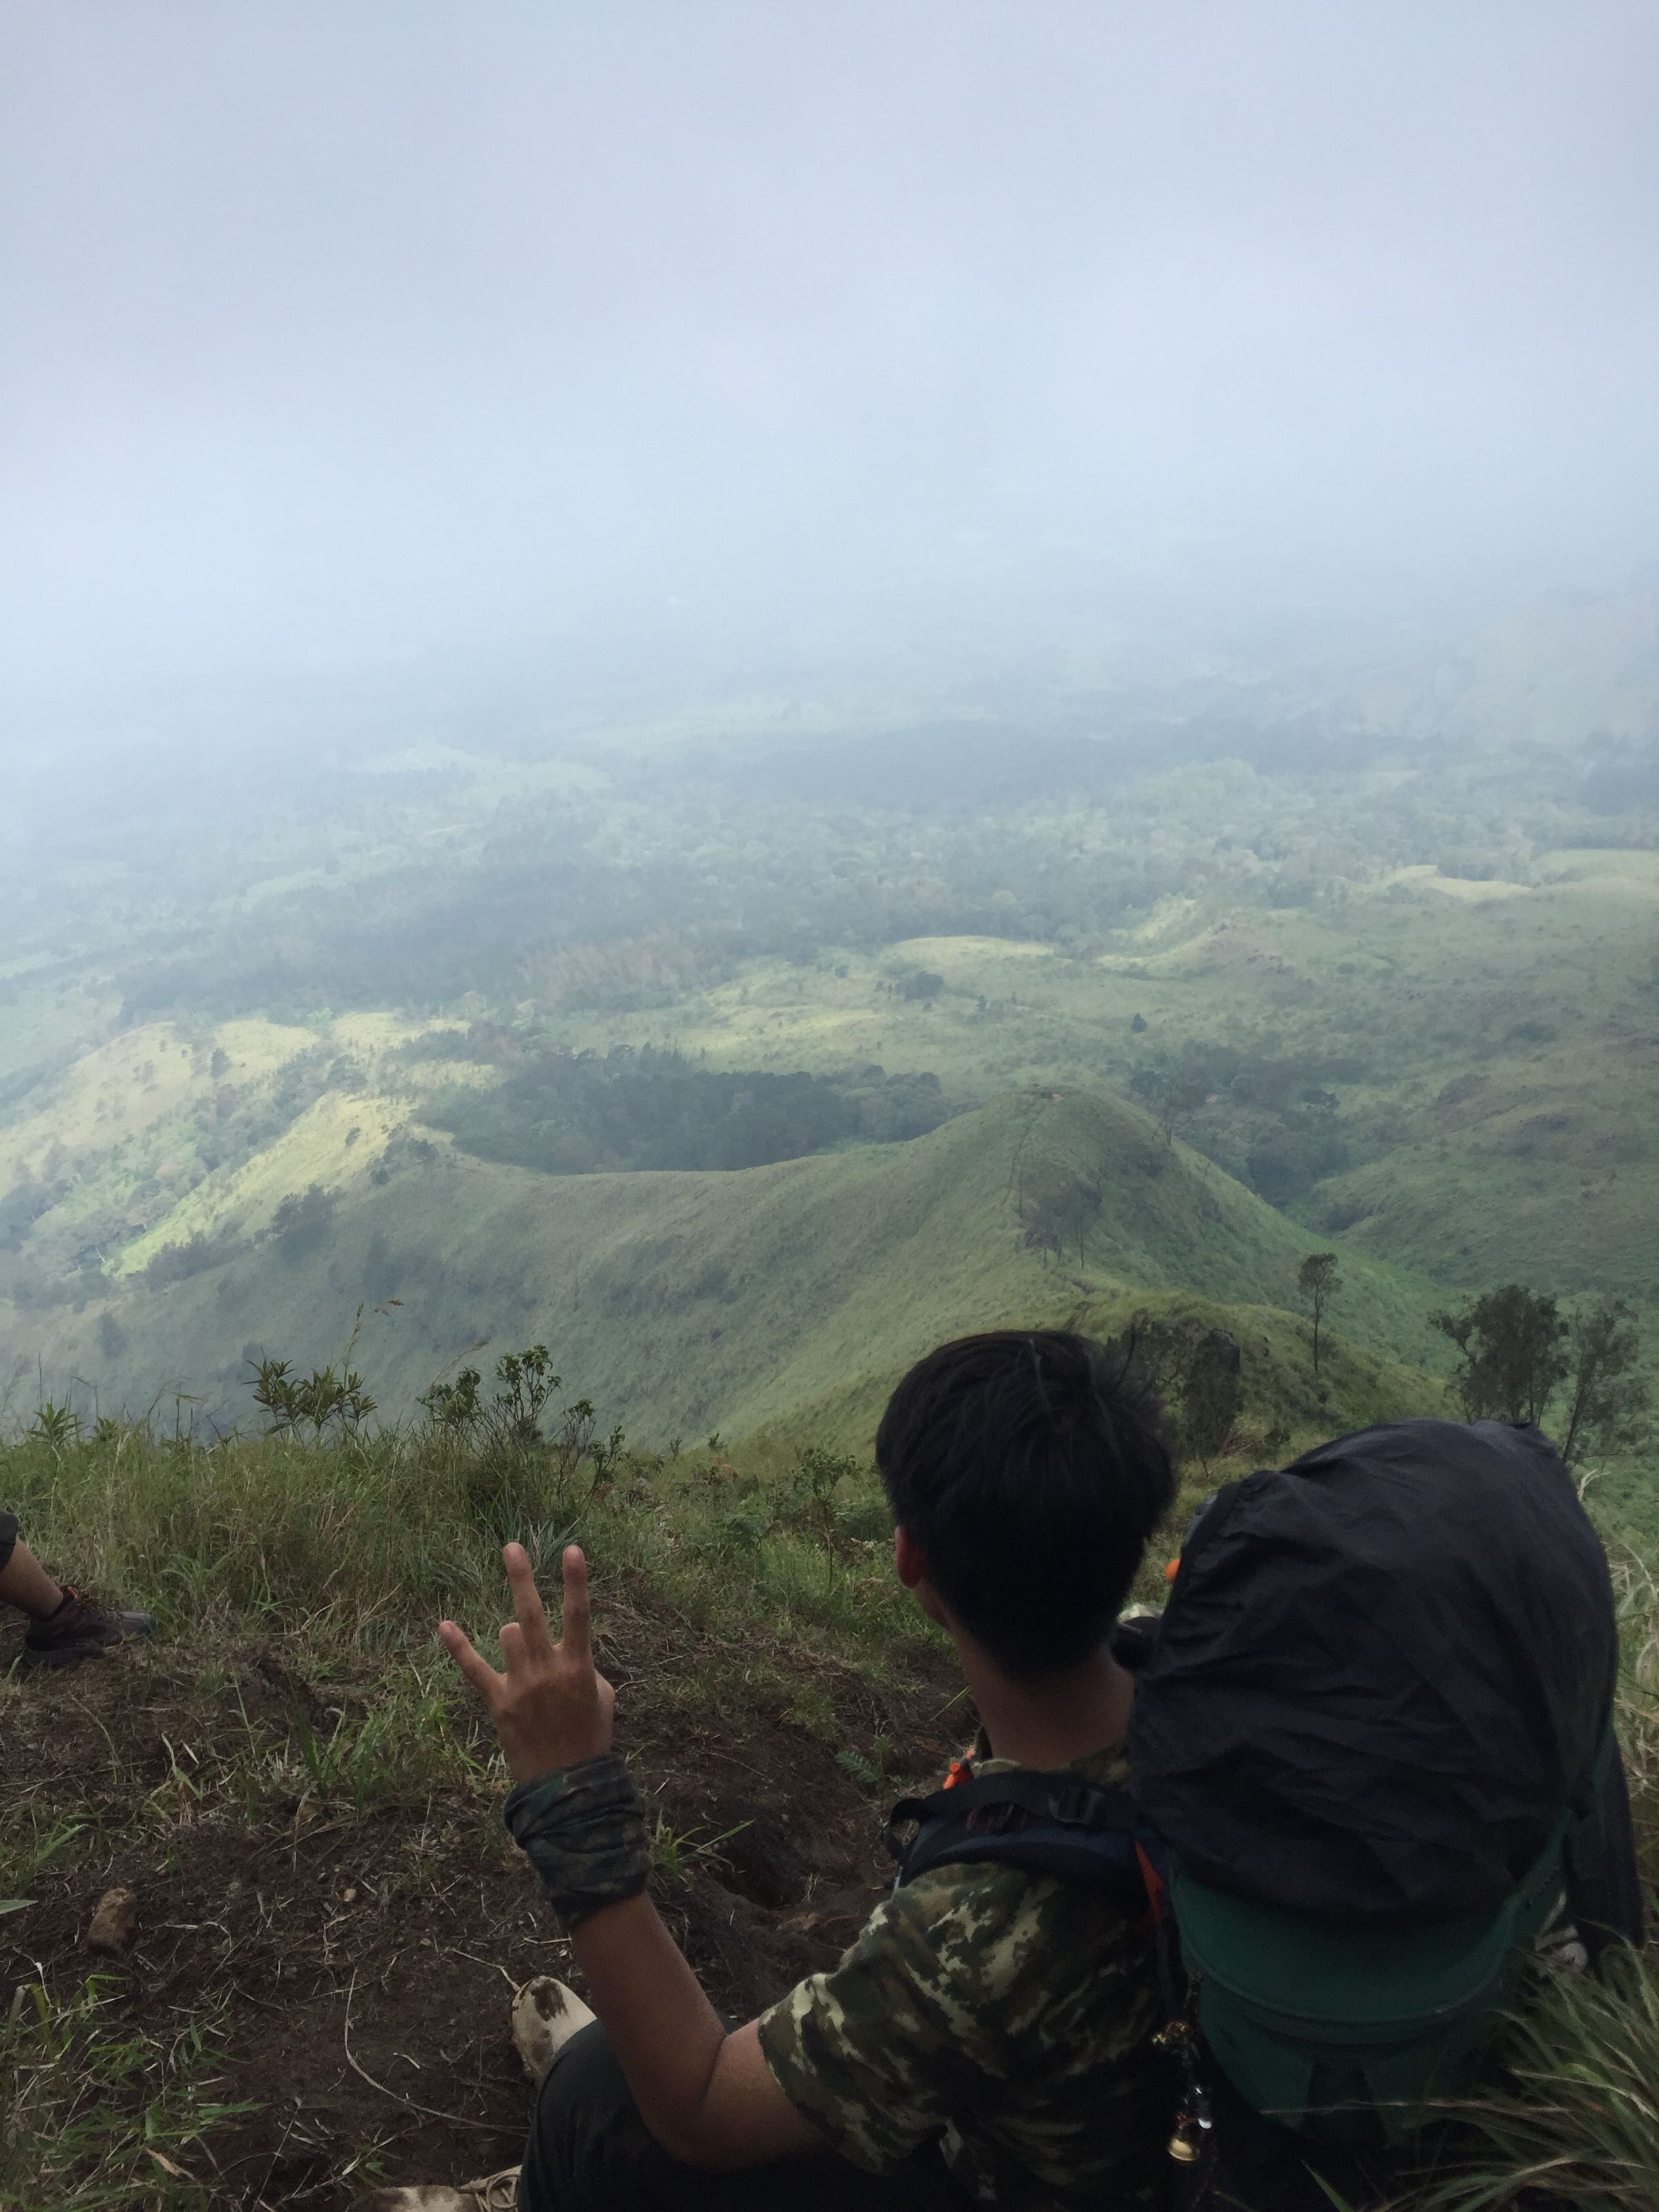 [CATPER] PENDAKIAN ARJUNO-WELIRANG via LAWANG turun TRETES (7-9 APRIL 2018)